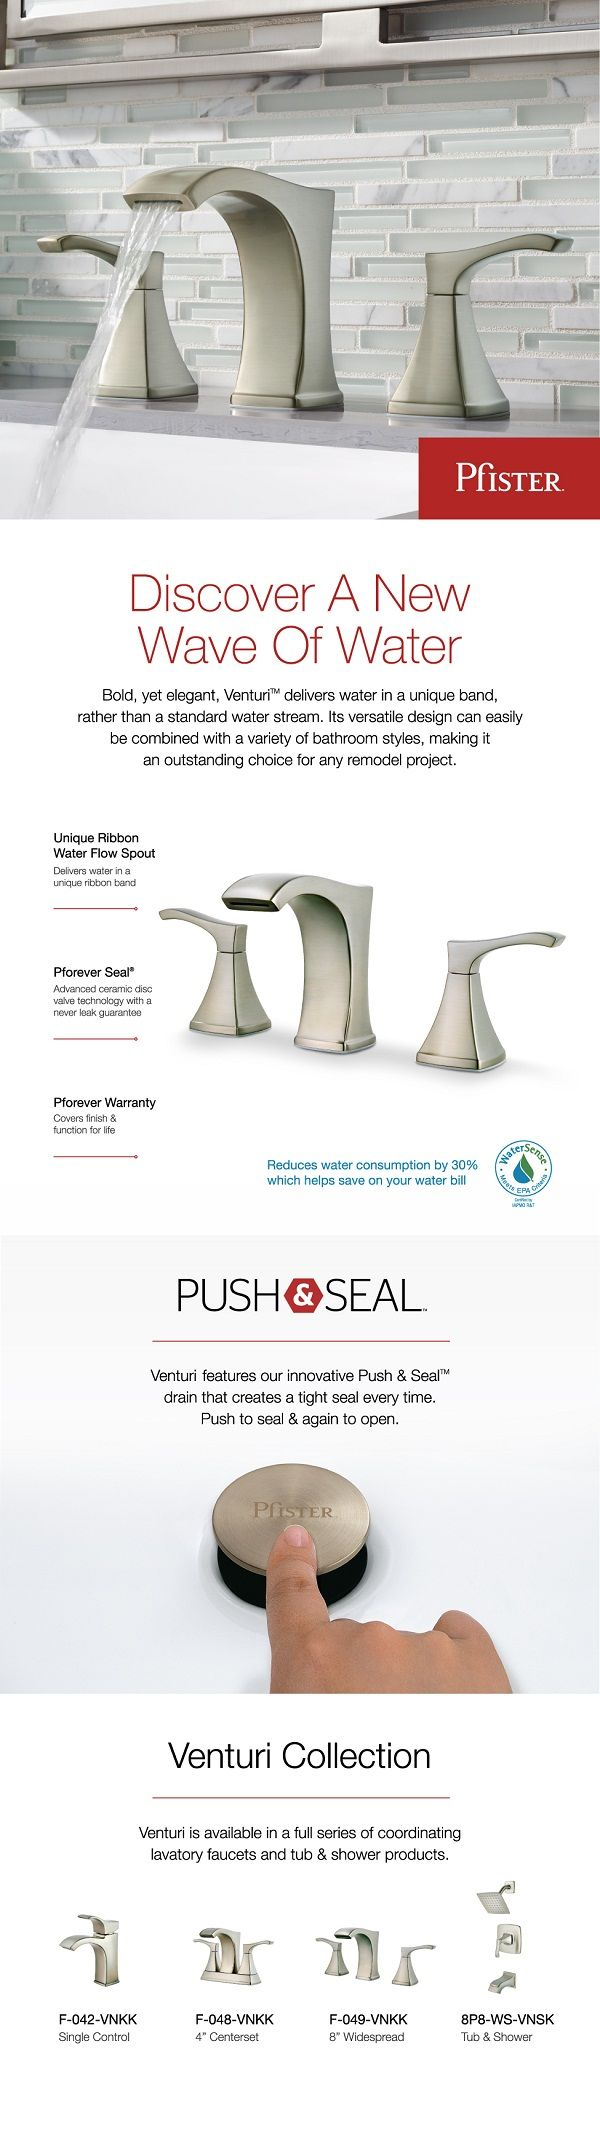 pfister venturi 8 in. widespread 2-handle bathroom faucet in